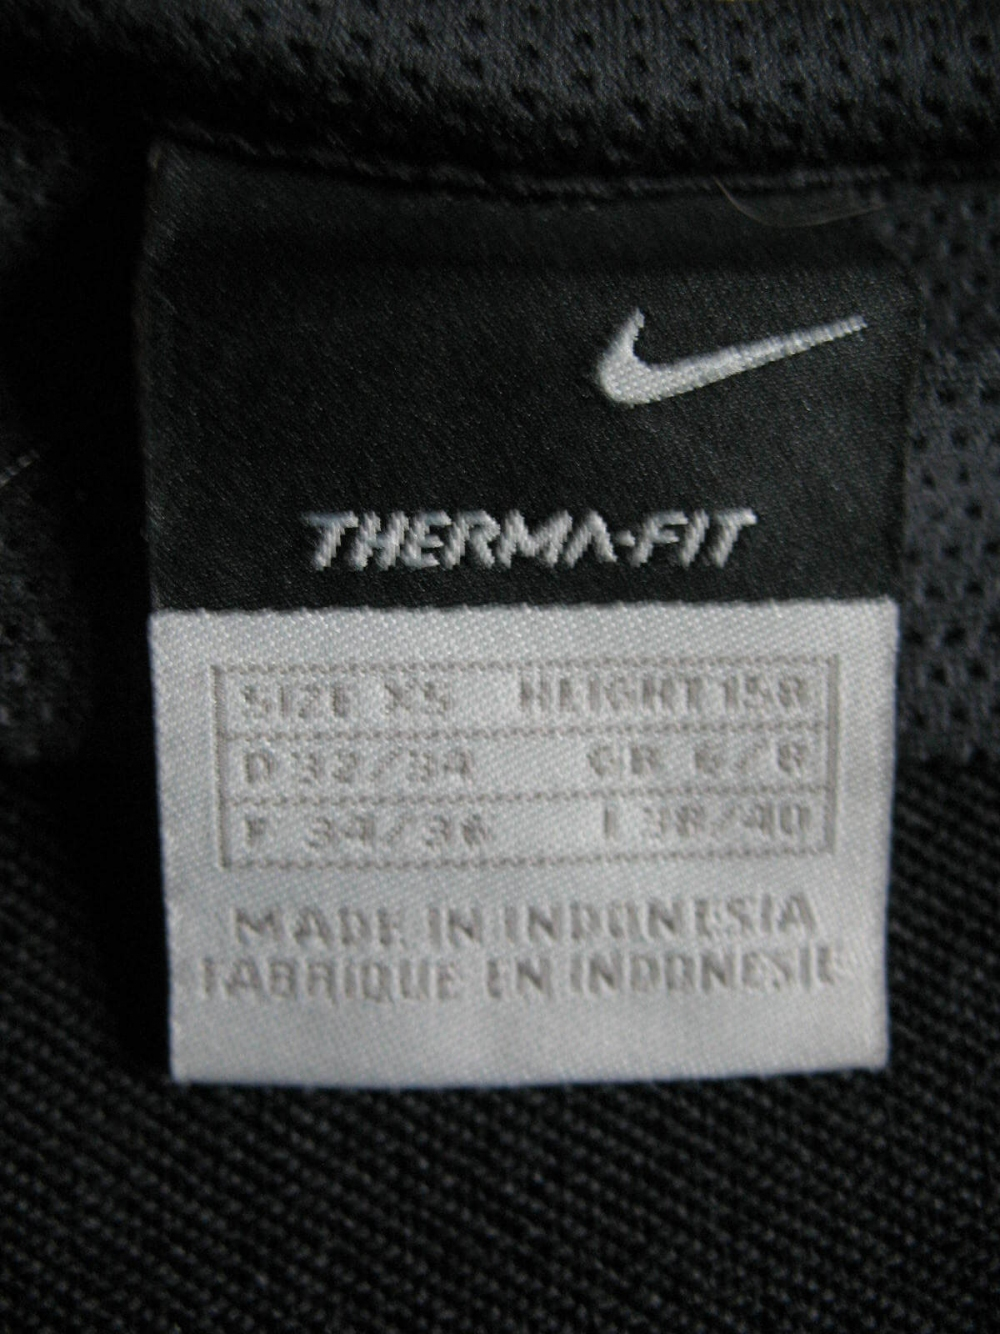 Кофта NIKE therma fit fleece jersey lady (размер XS(реально S/M)) - 3